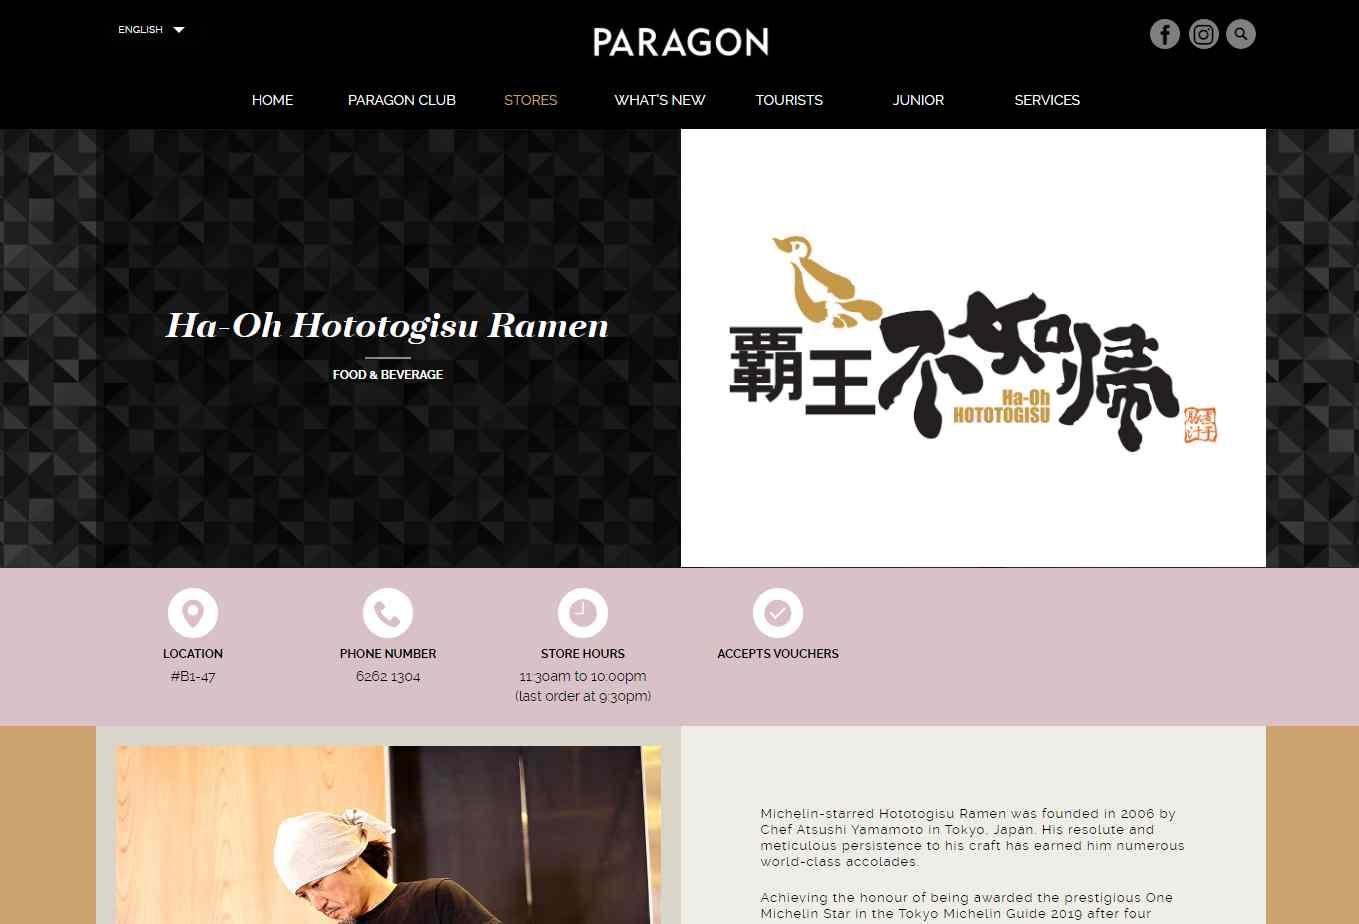 paragon Top Ramen Restaurants in Singapore